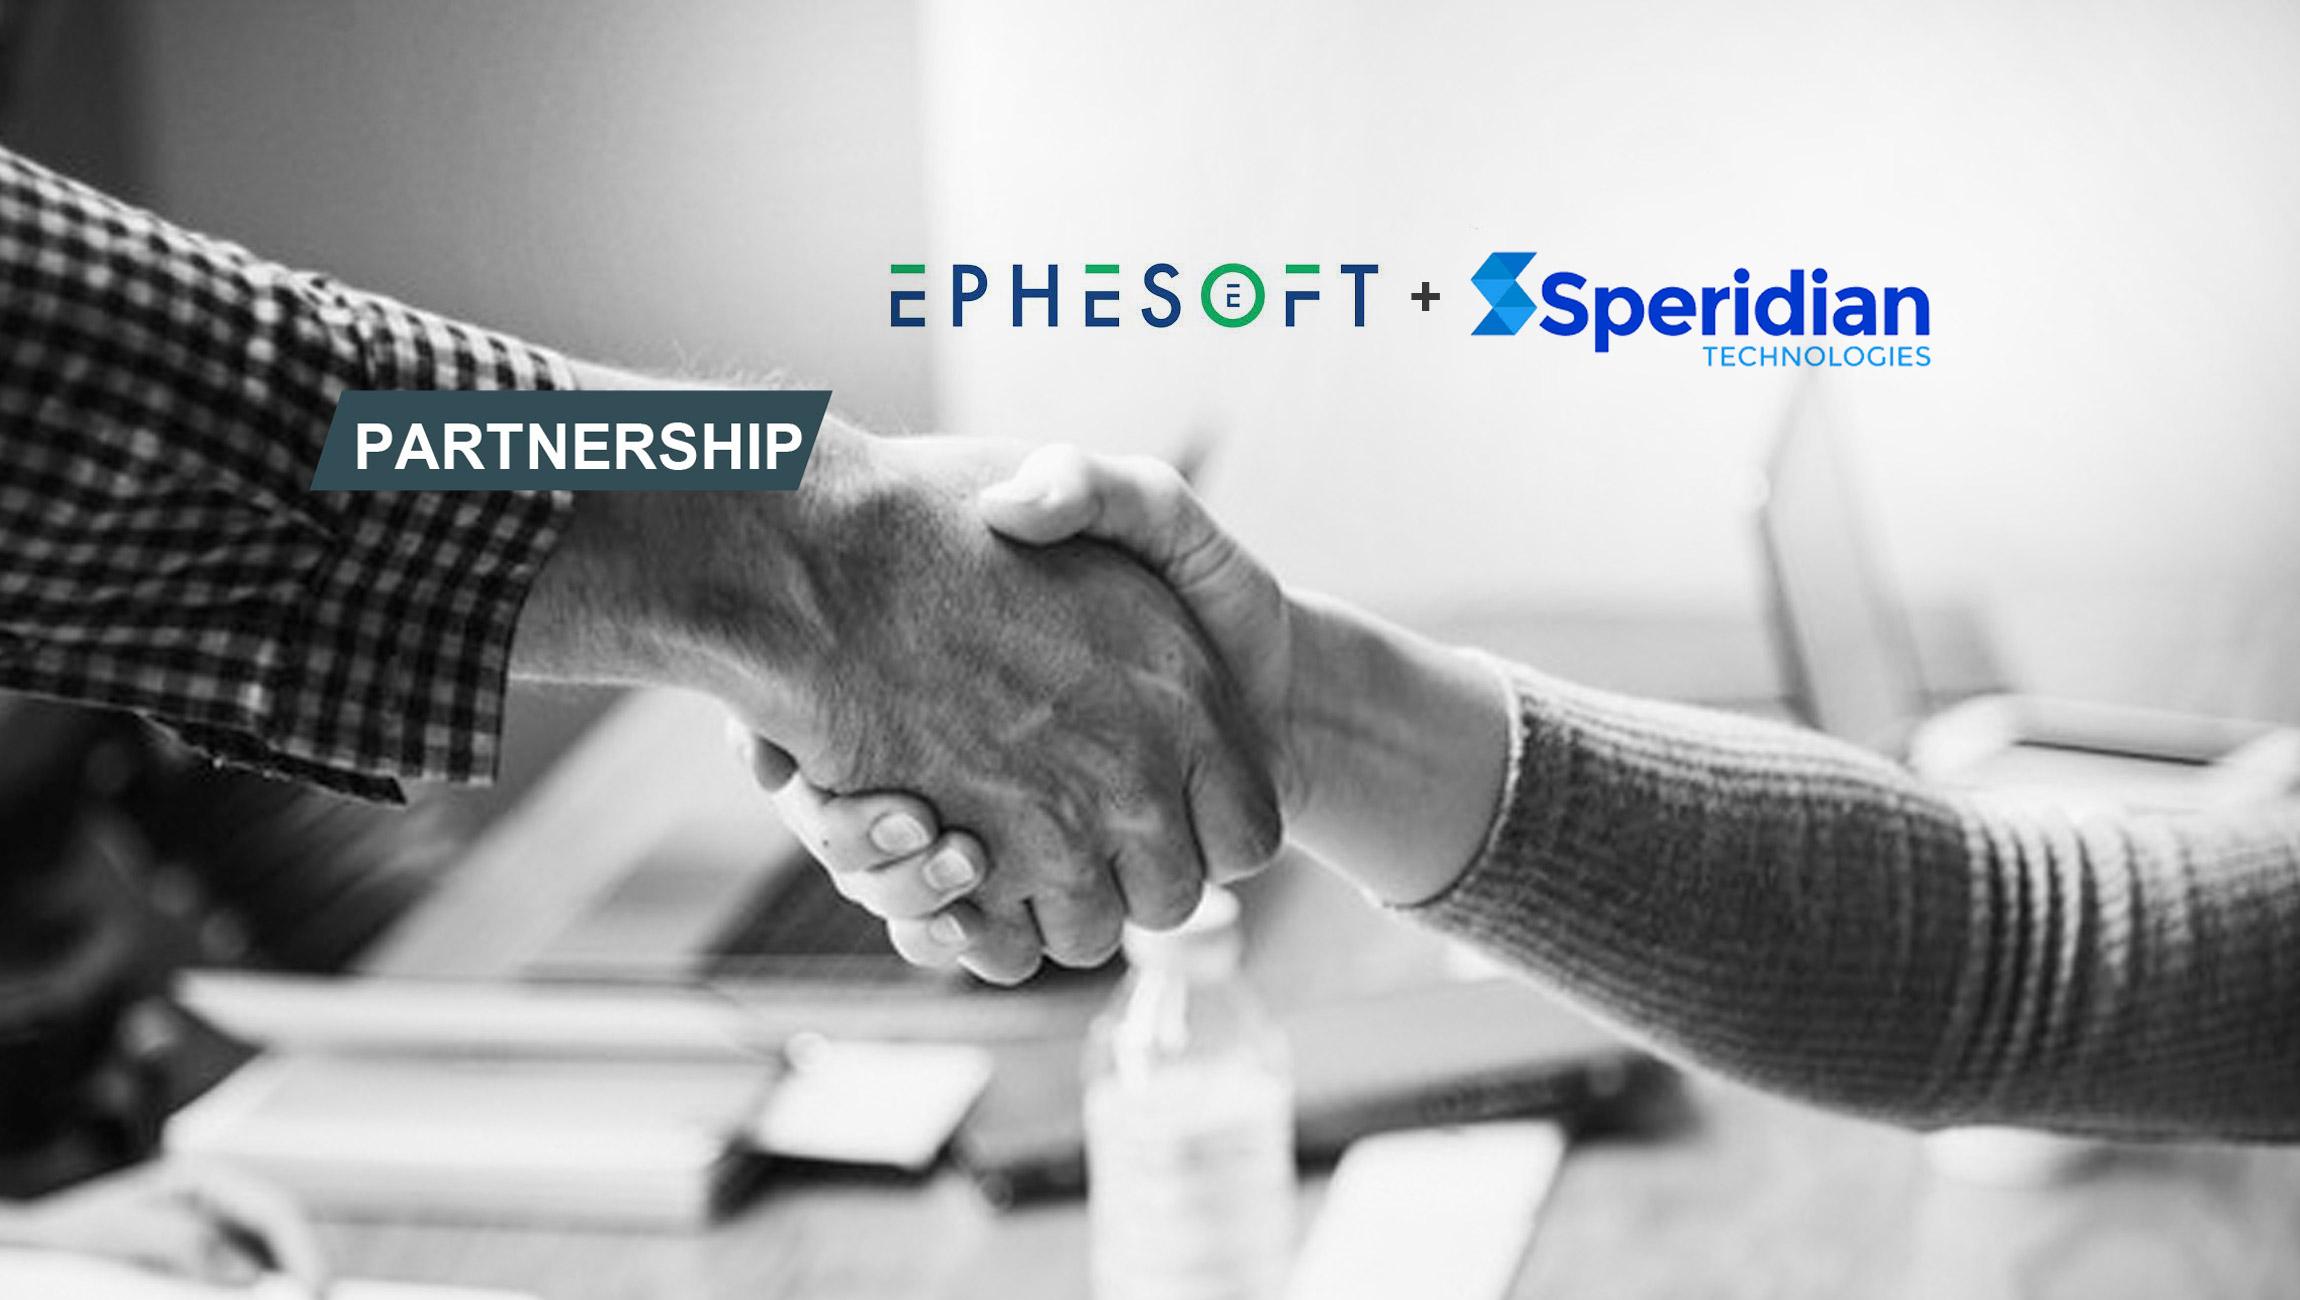 Ephesoft and Speridian Technologies Announce Strategic Global Alliance Partnership